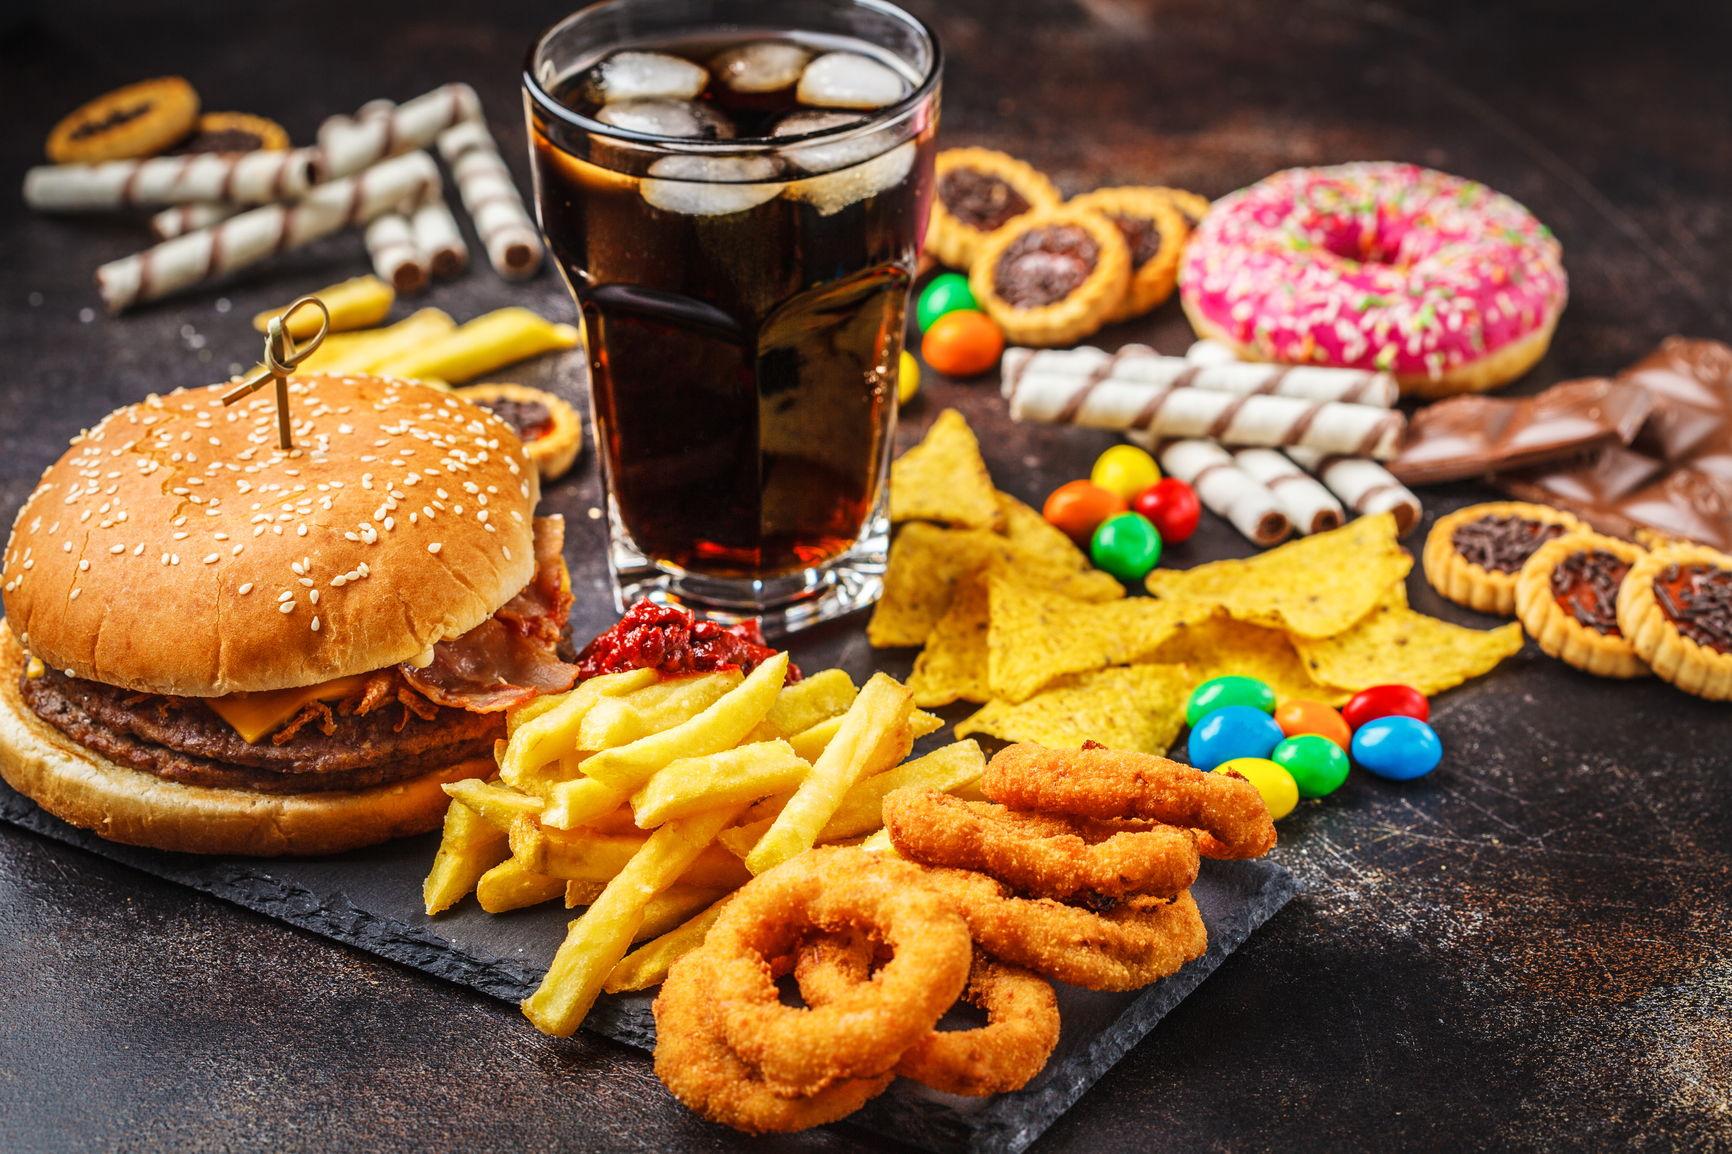 junk food er ikke den beste maten for hud og hår